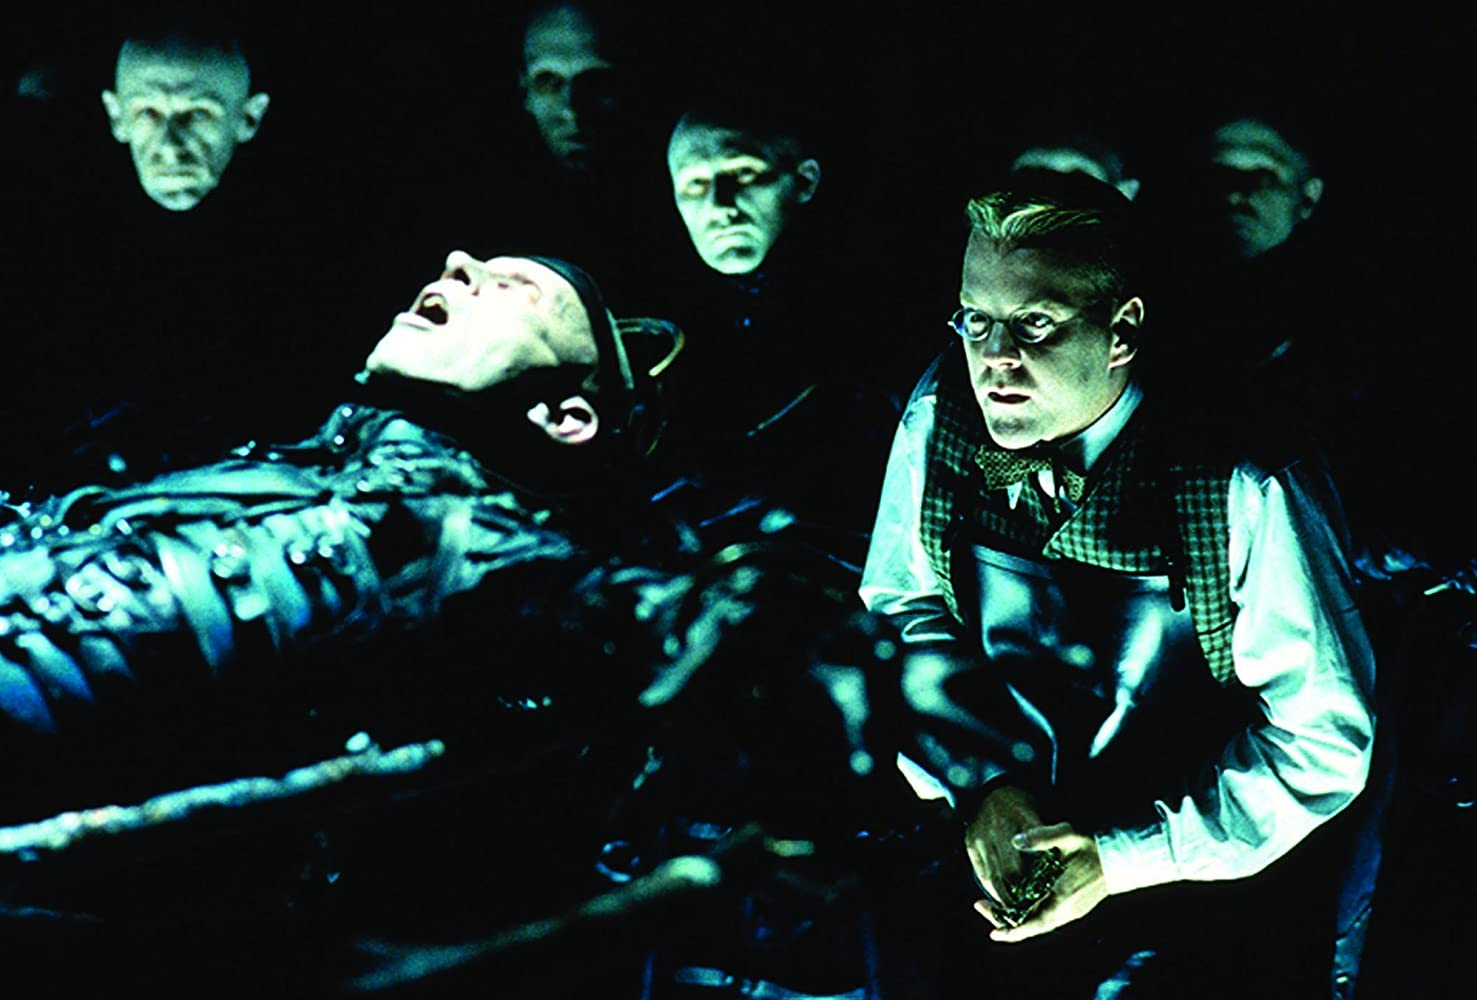 Kiefer Sutherland and Richard O'Brien in Dark City (1998)